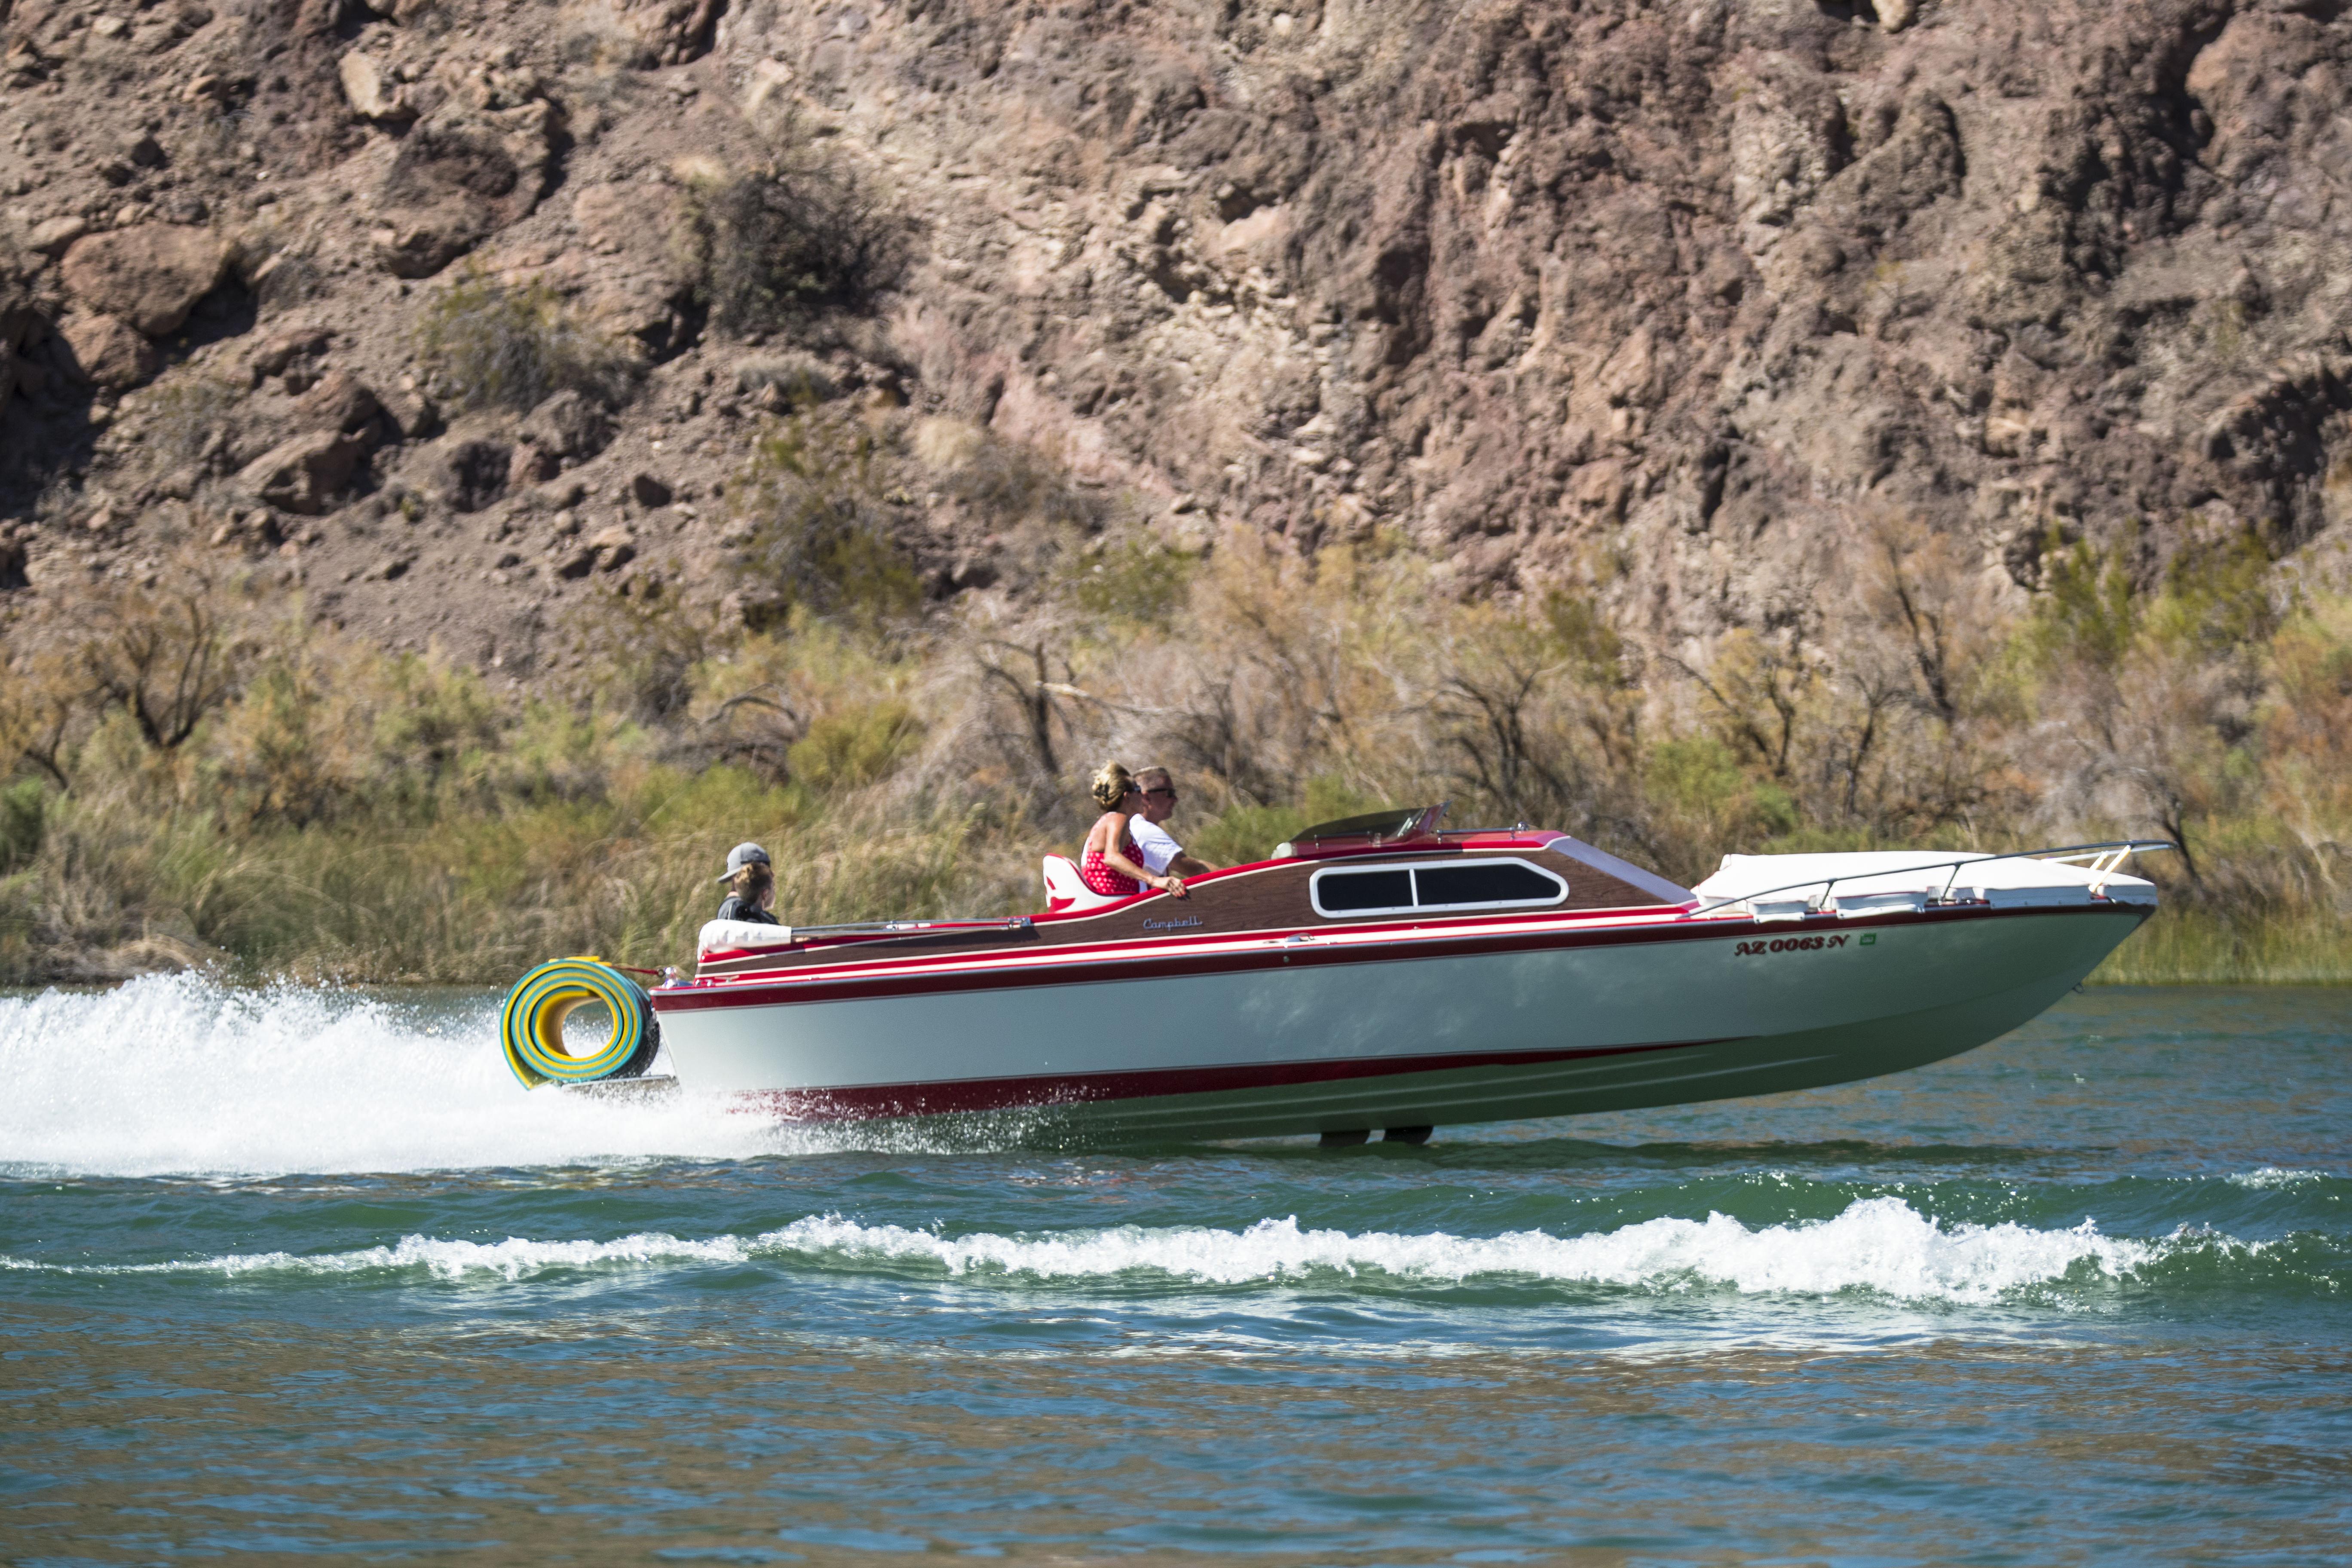 04 campbell-regatta-2018-tom-leigh-5069.jpg